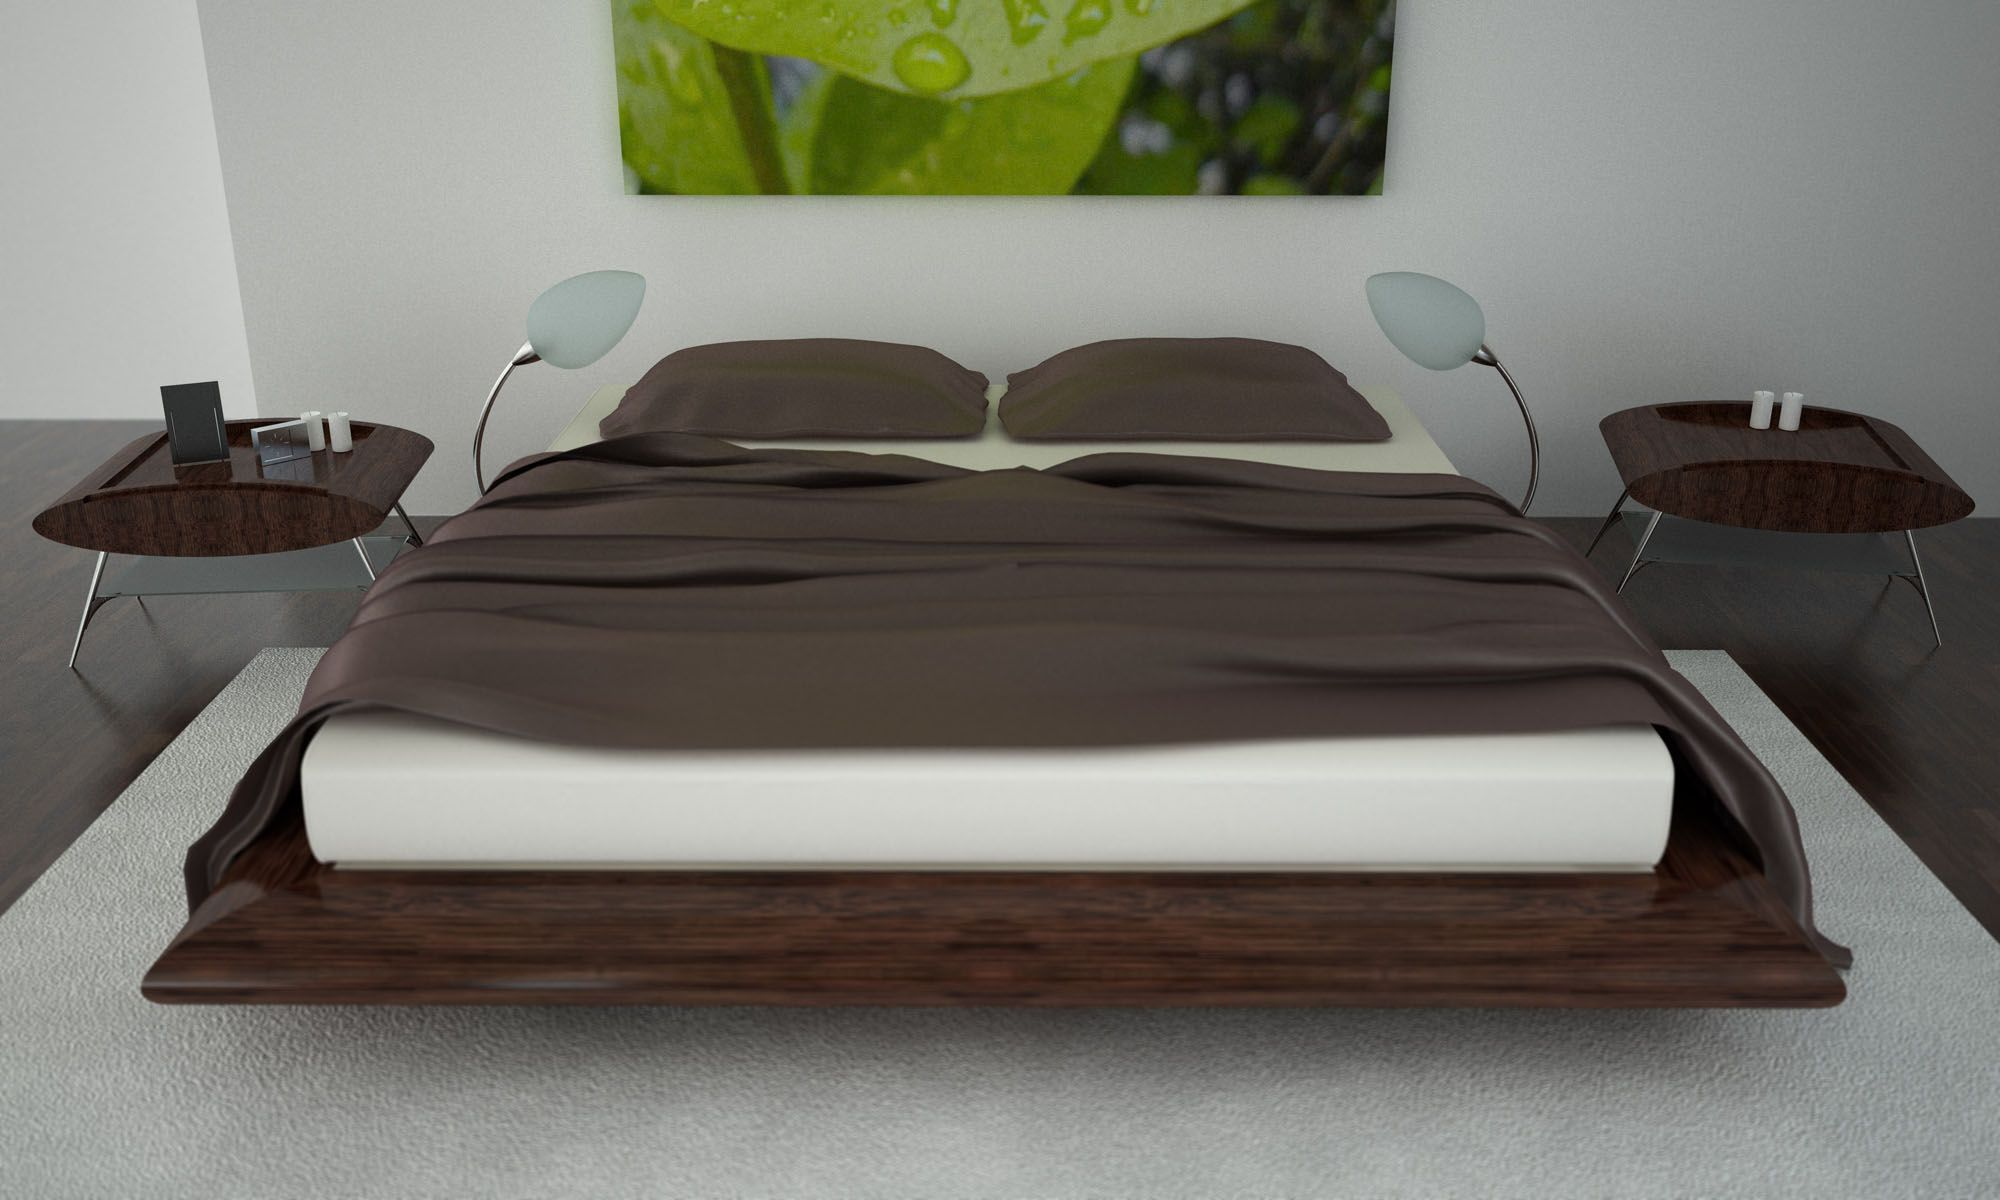 Bed Designs Pictures 24 Bed Designs Pictures